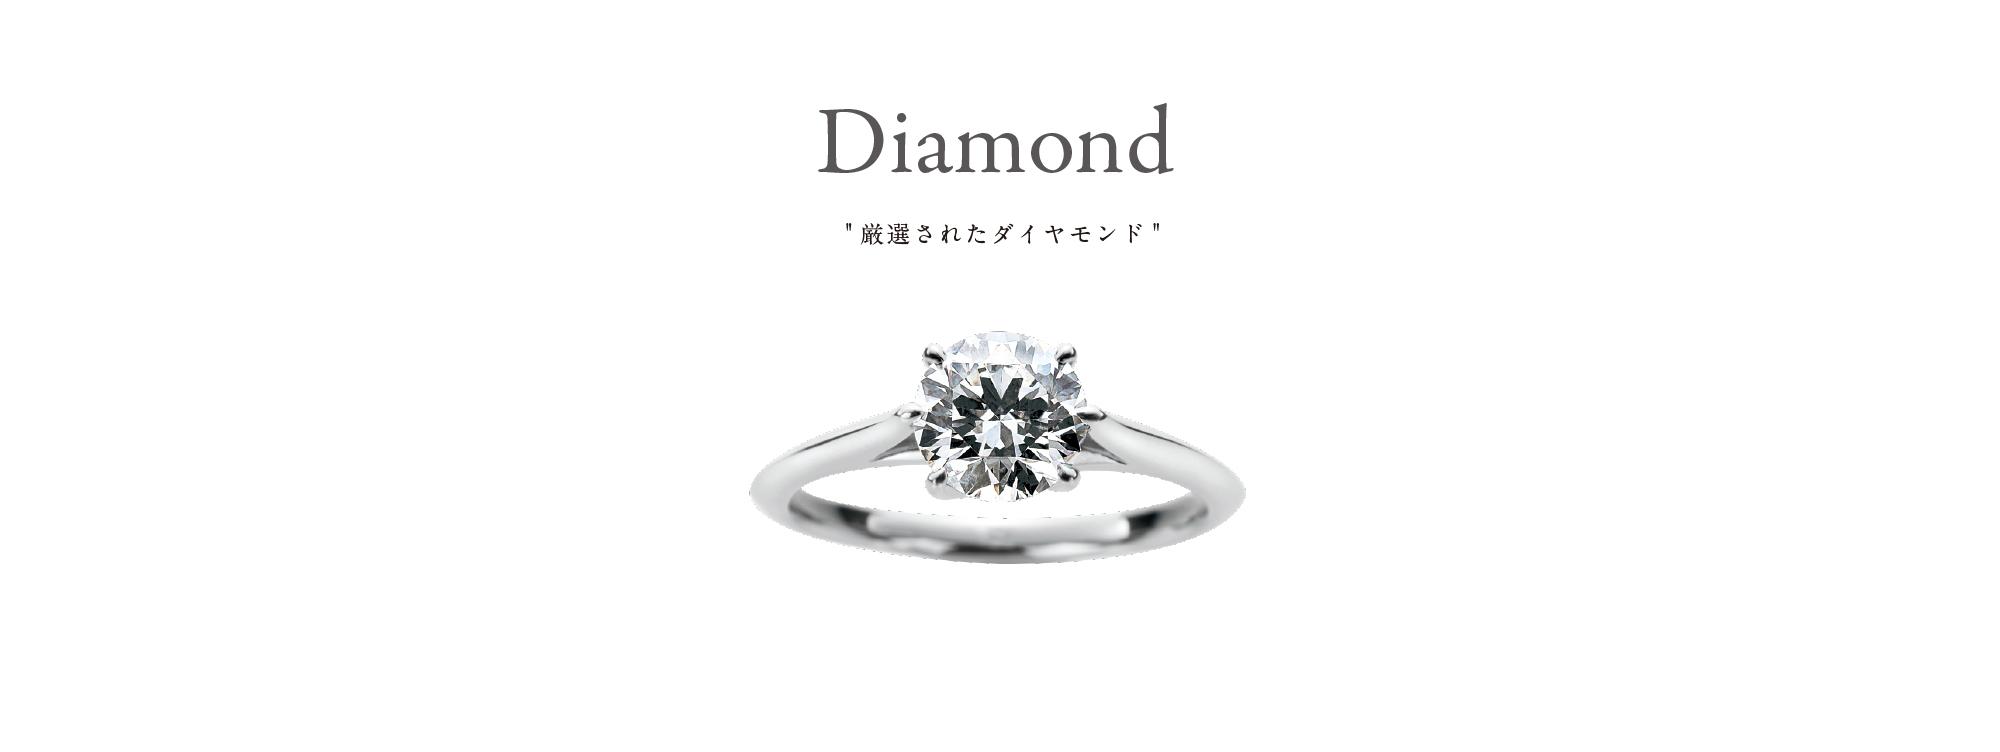 Diamond 厳選されたダイアモンド